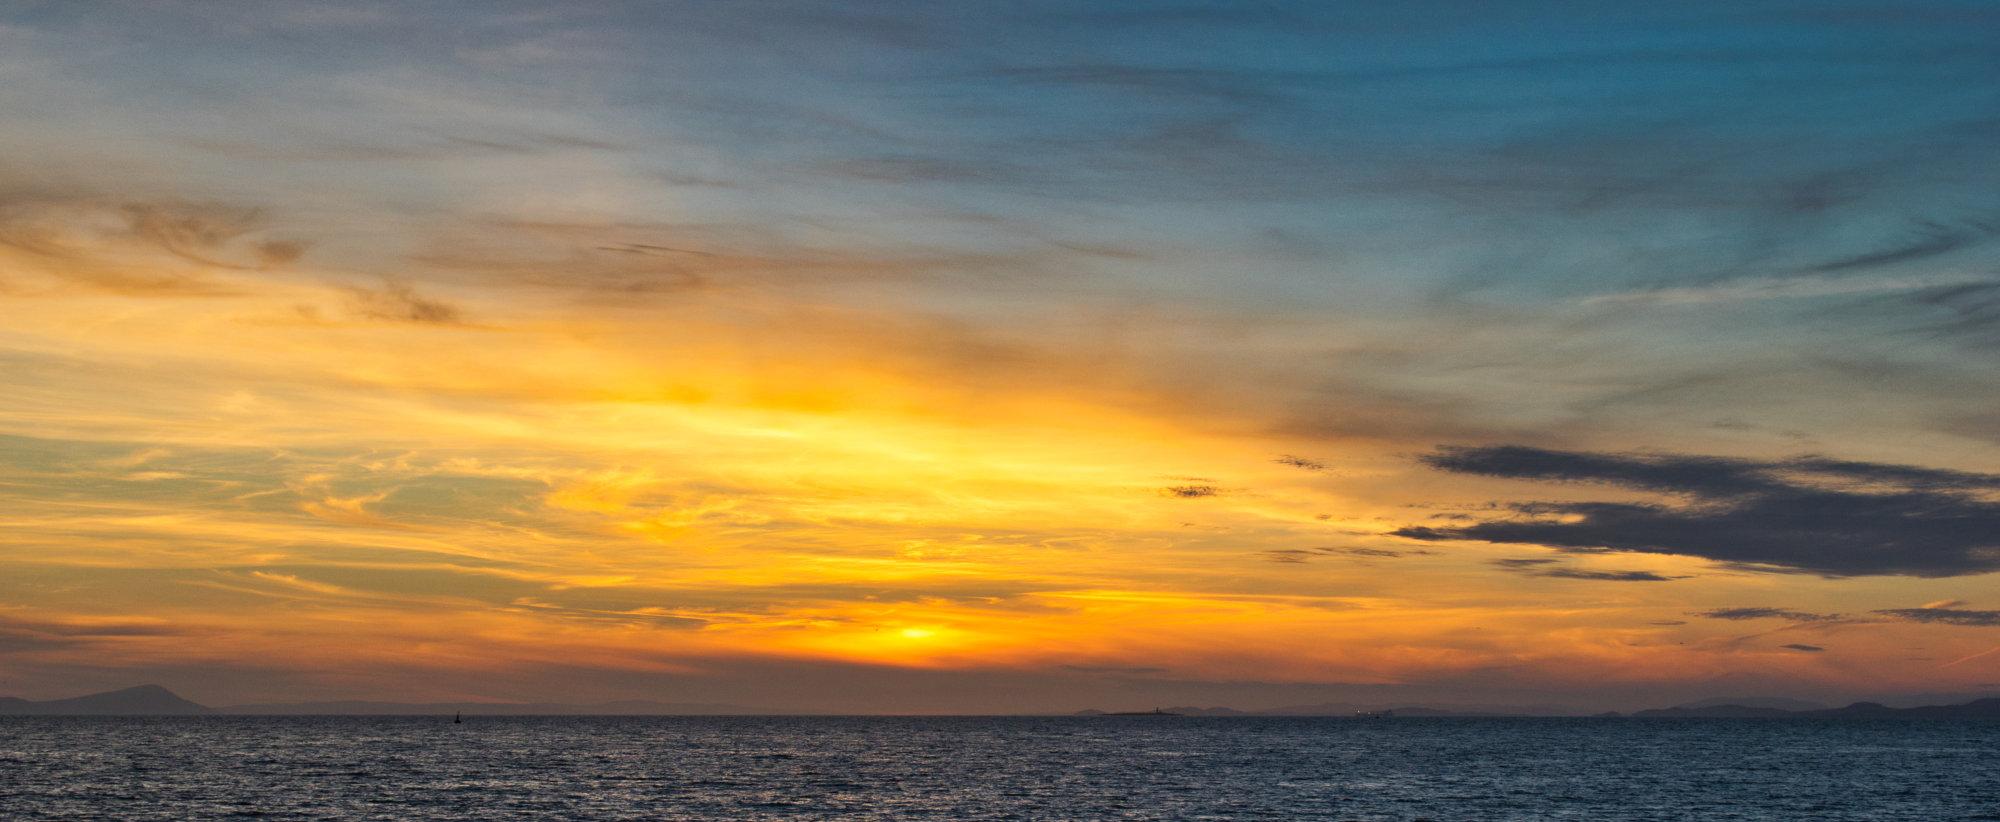 Sunset over Ayr